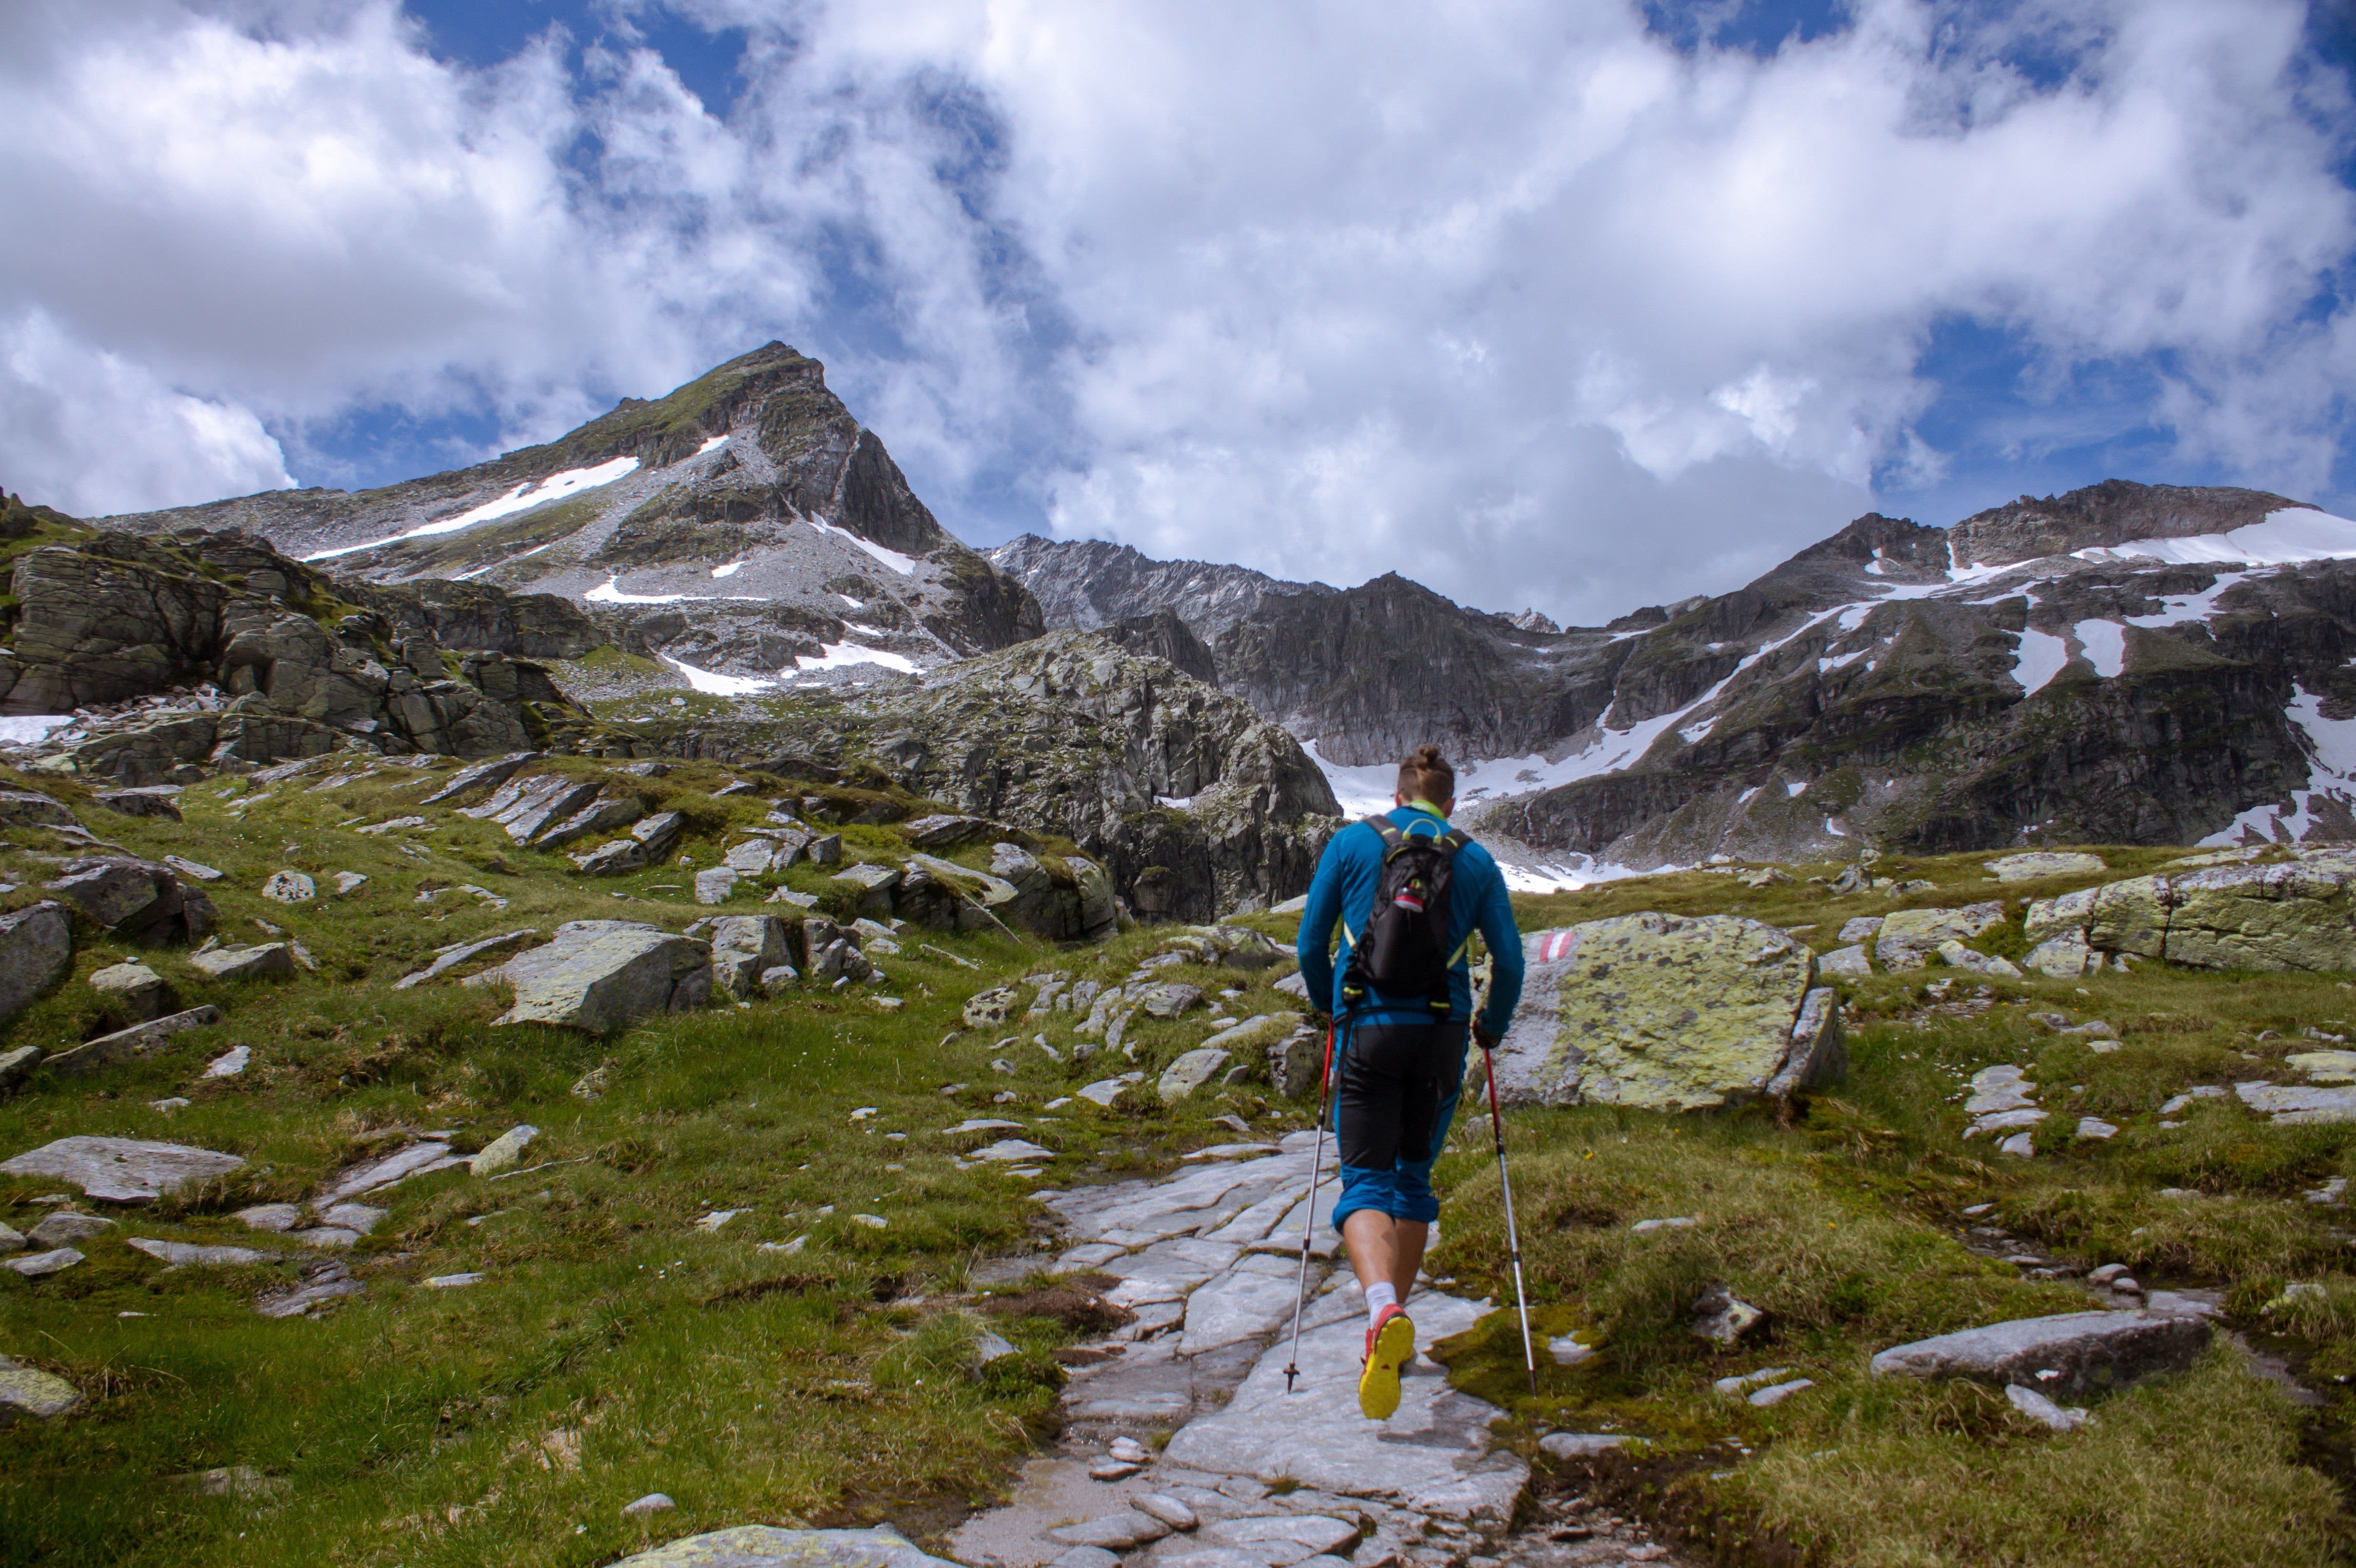 backcountry essentials trekking poles